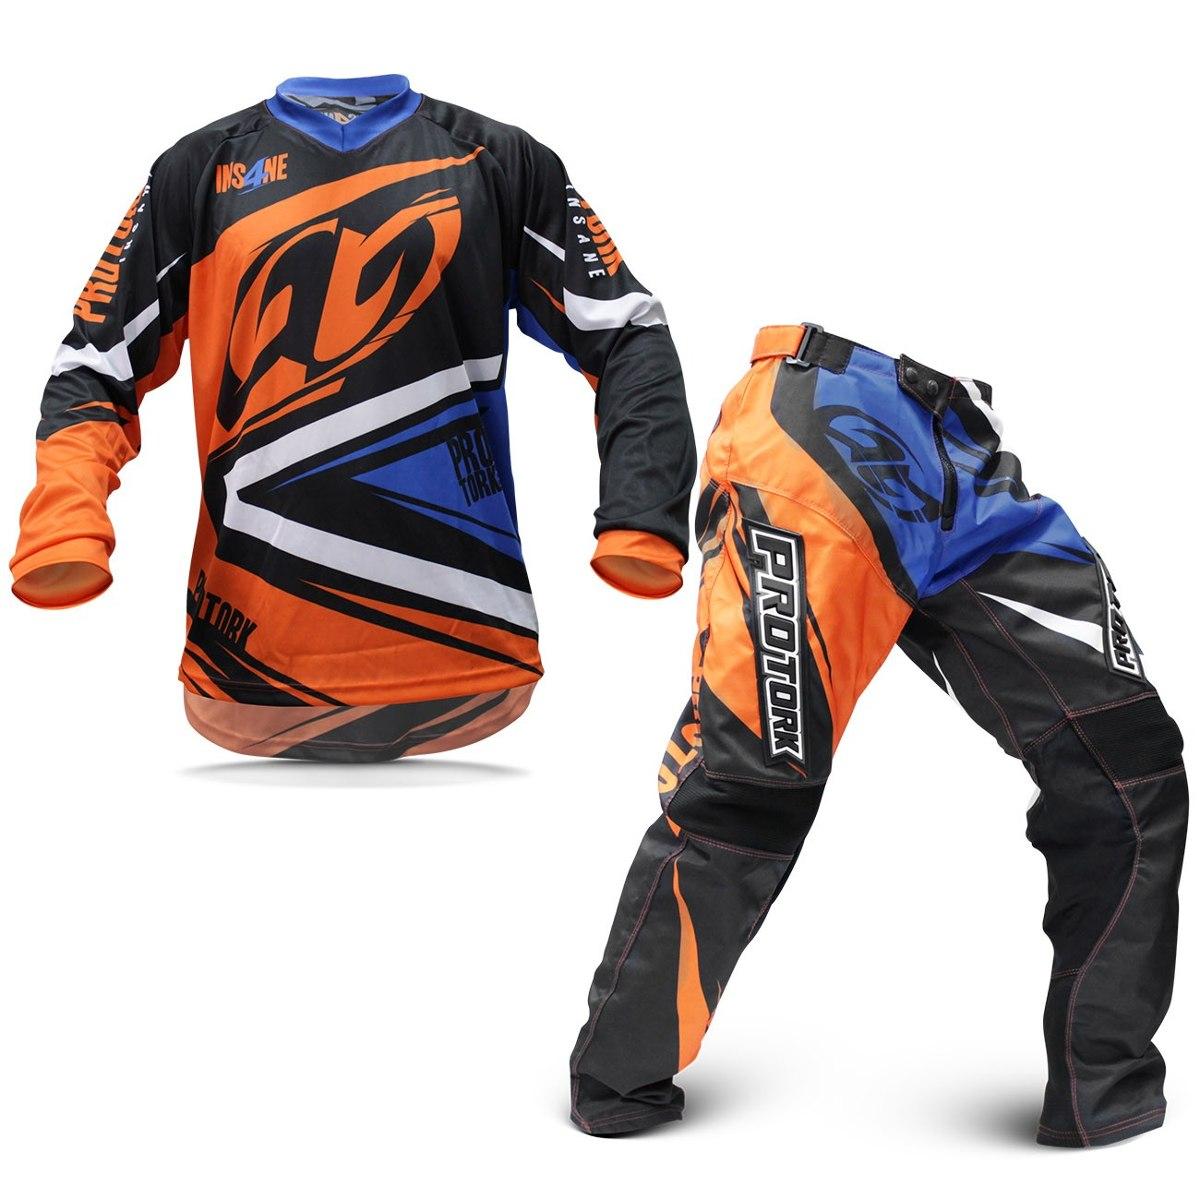 024eacd1c kit roupa para motocross pro tork insane 4 trilha. Carregando zoom.